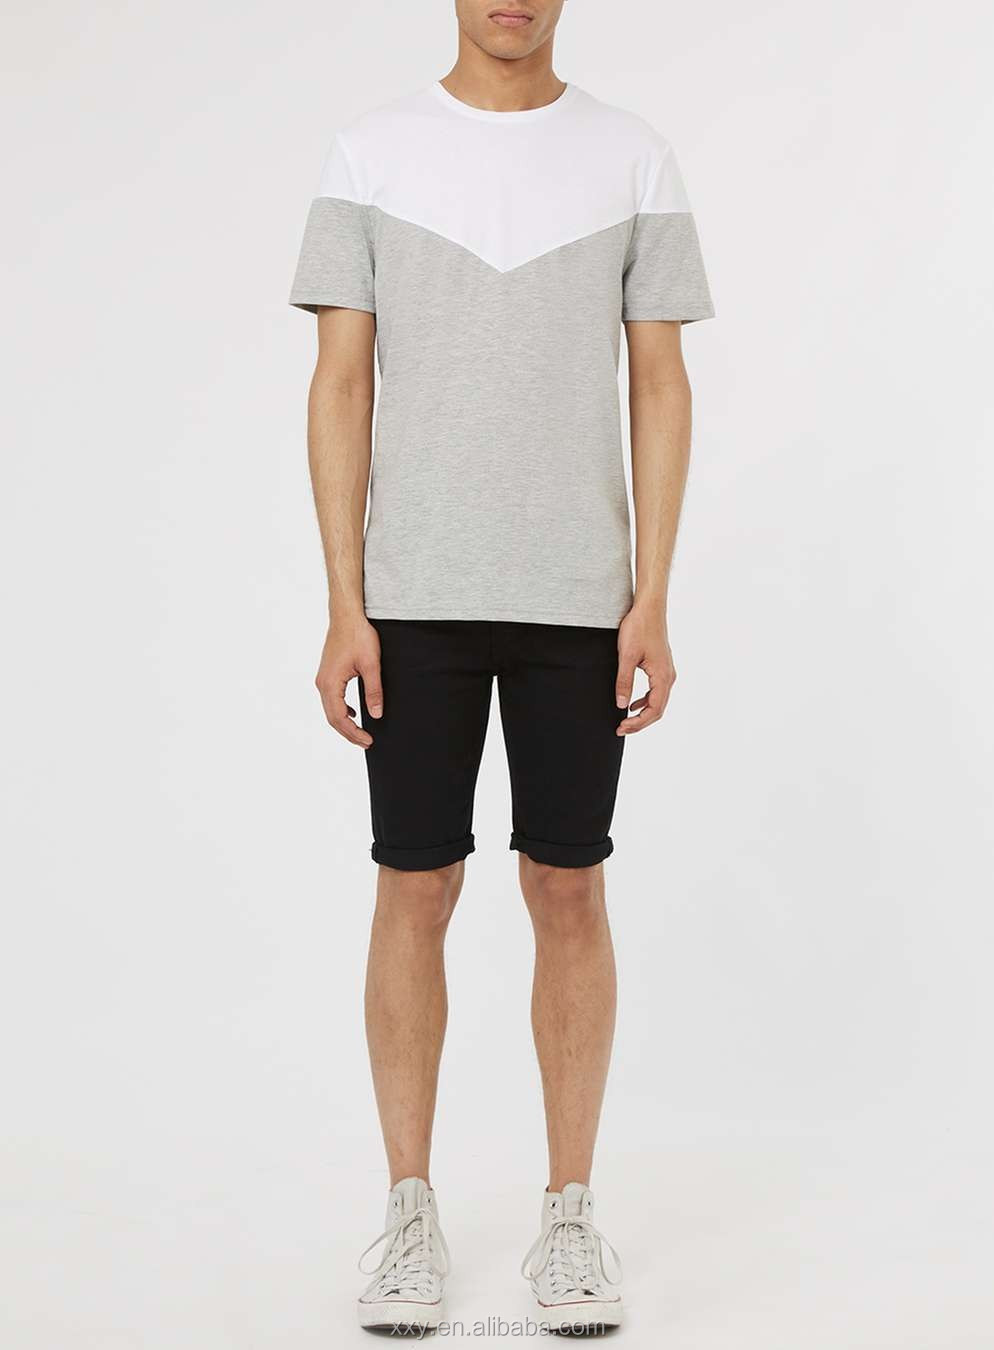 Plain T Shirts For Printing Cheap Wholesale Two Toned Bulk Blank T